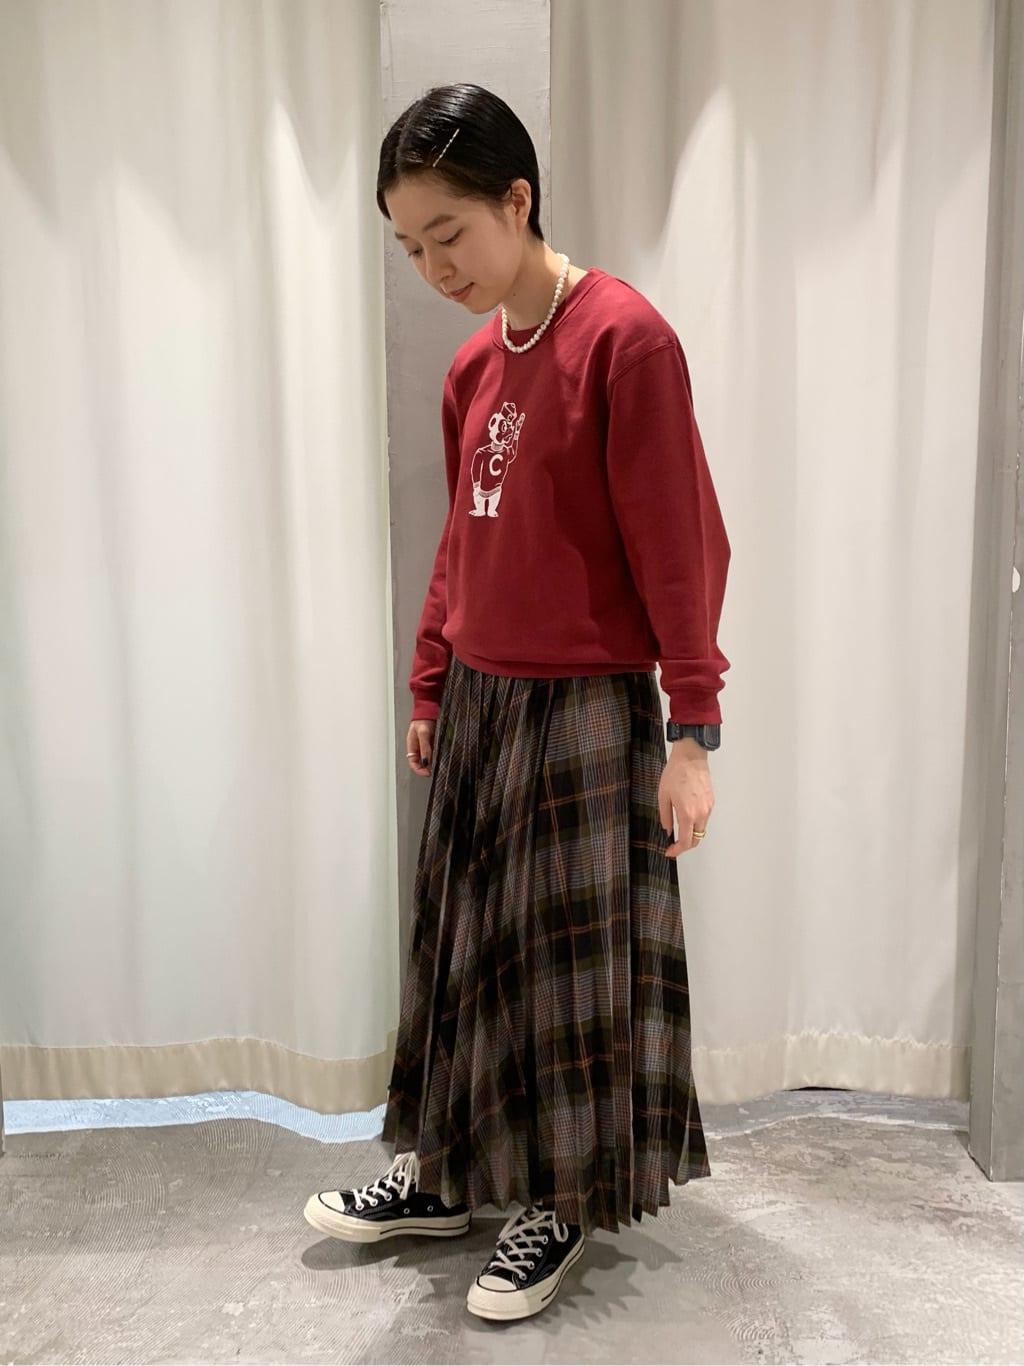 - CHILD WOMAN CHILD WOMAN , PAR ICI ルミネ横浜 身長:158cm 2021.09.07